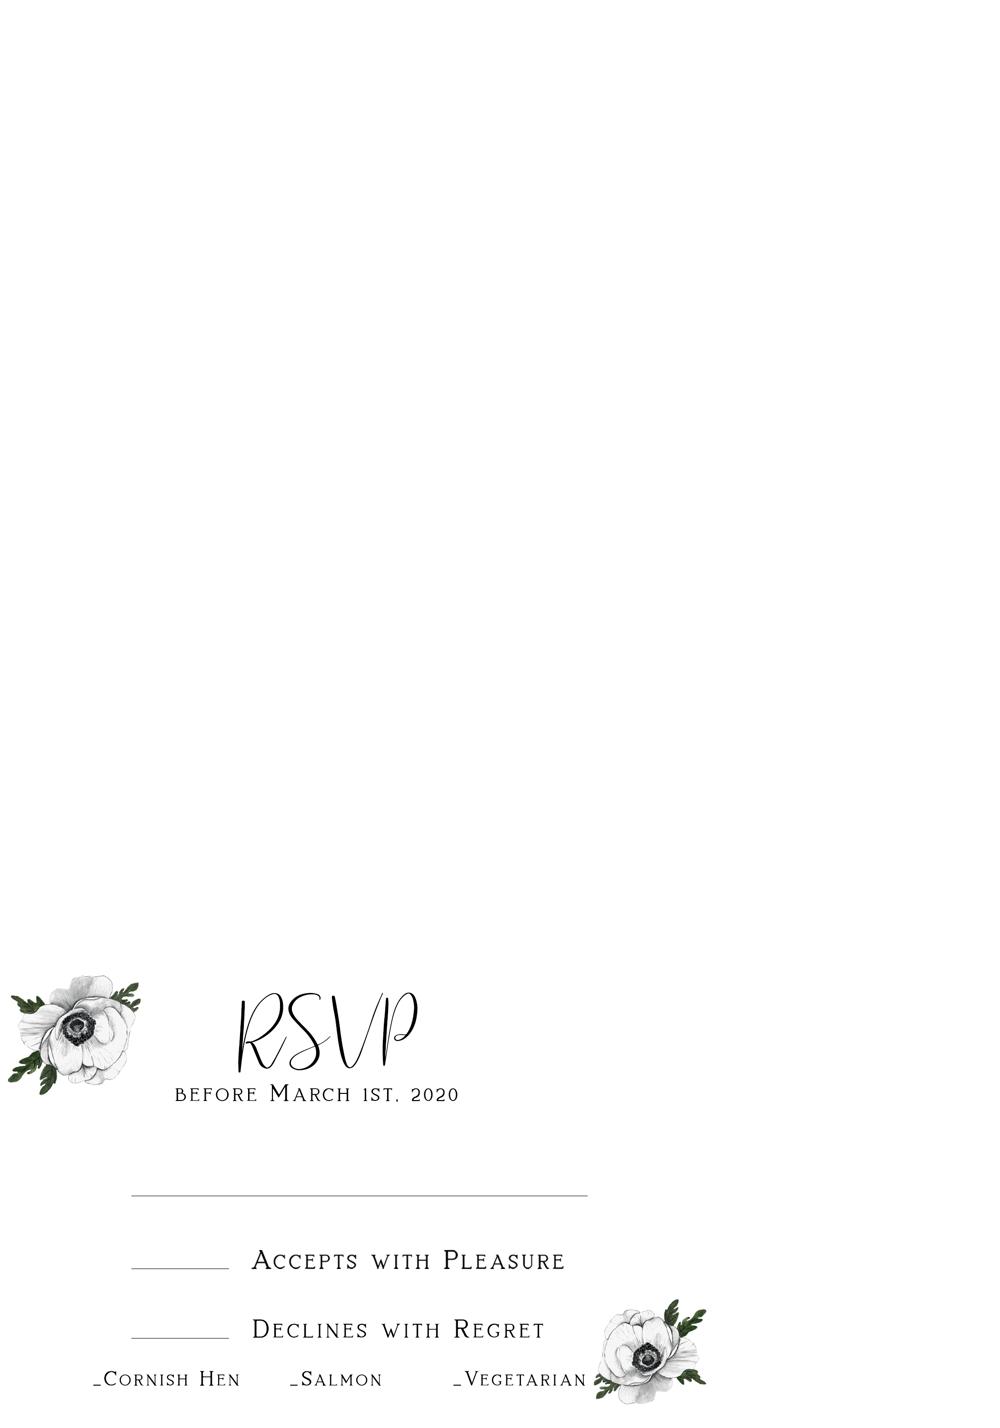 Anemones Wedding - image 4 - student project